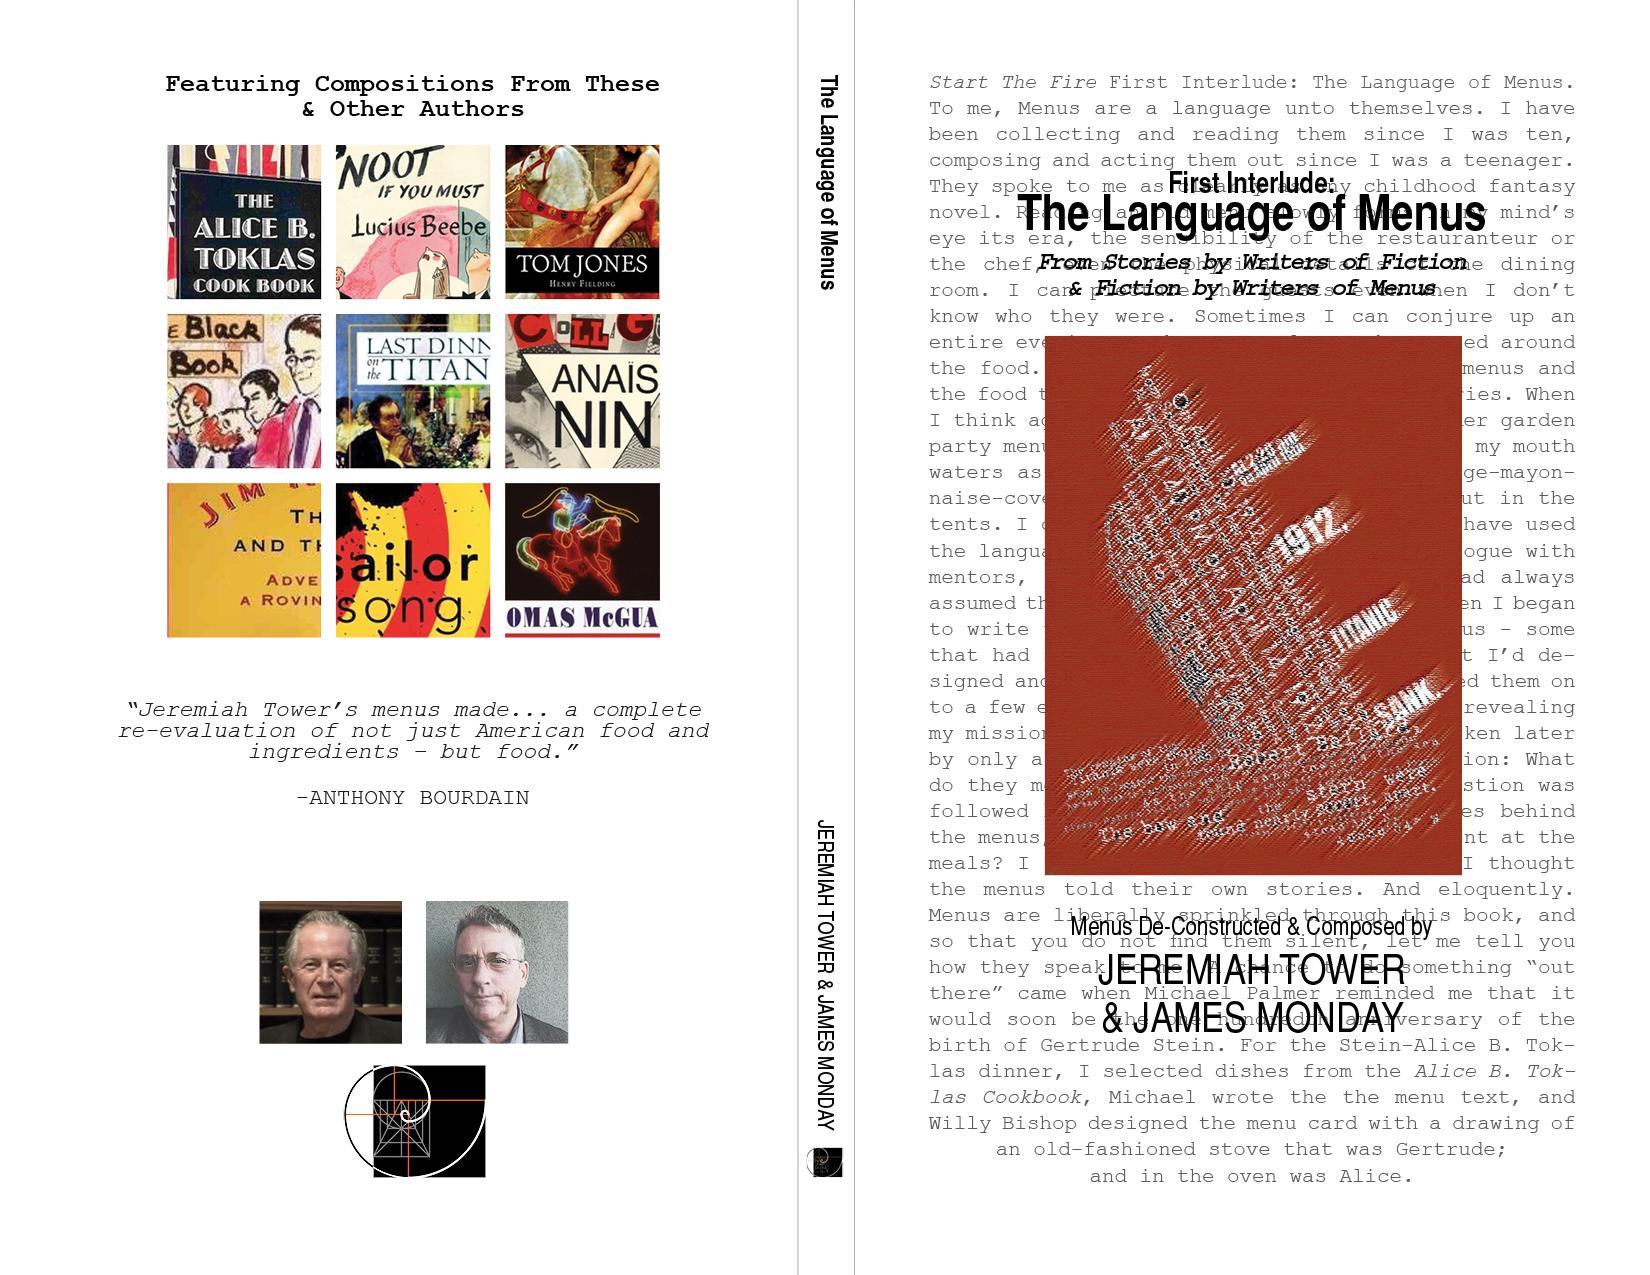 First Interlude: The Language of Menus